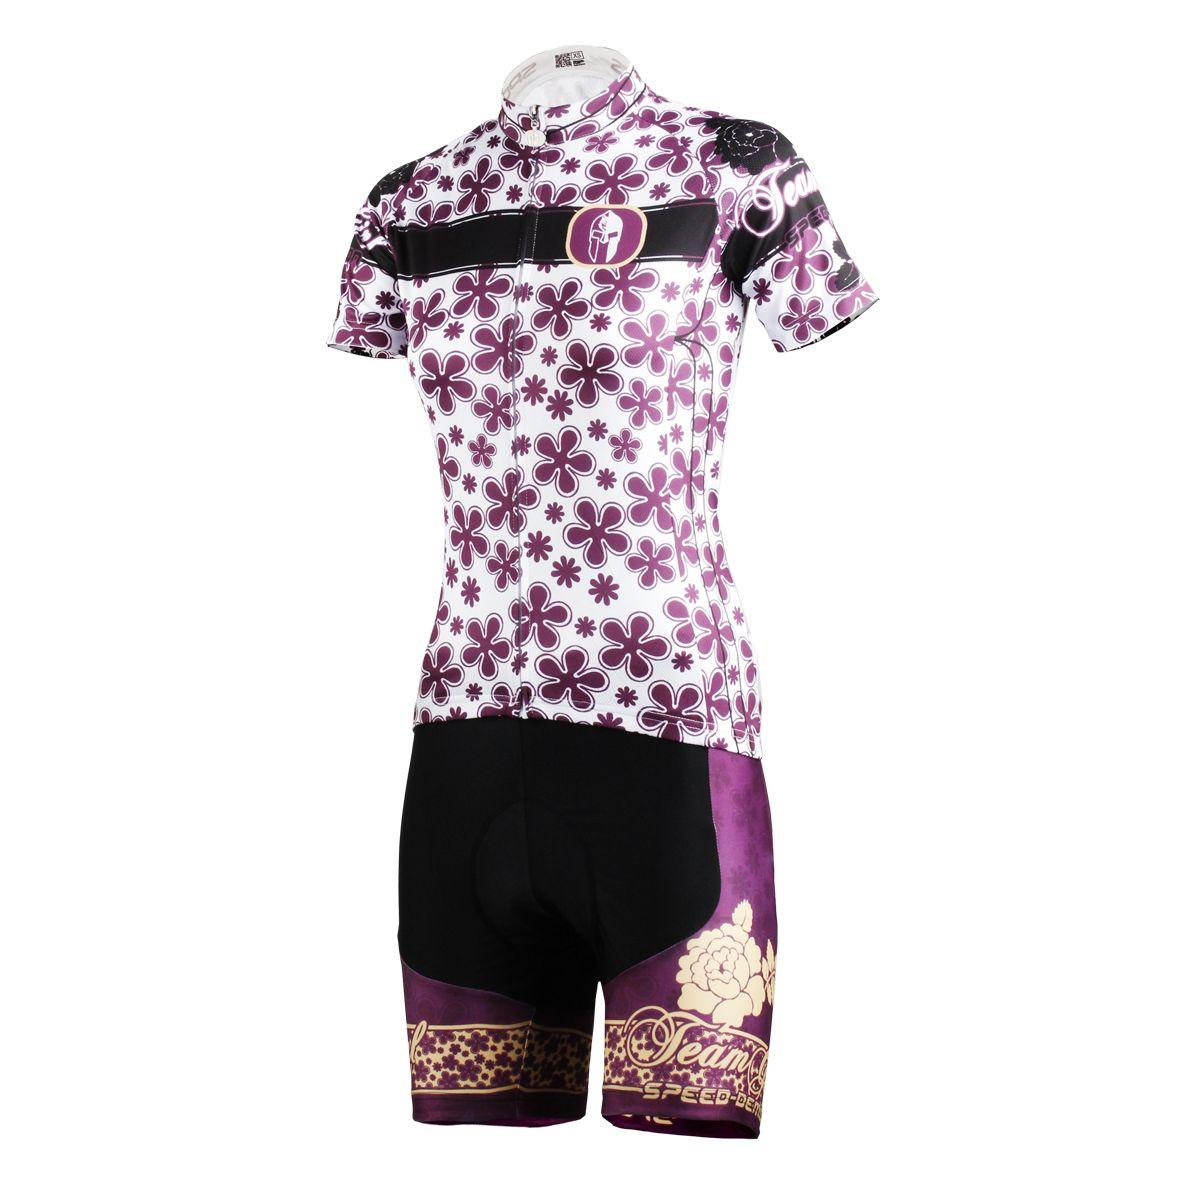 Mountain Bike Apparel,cycling apparel brands,cycling